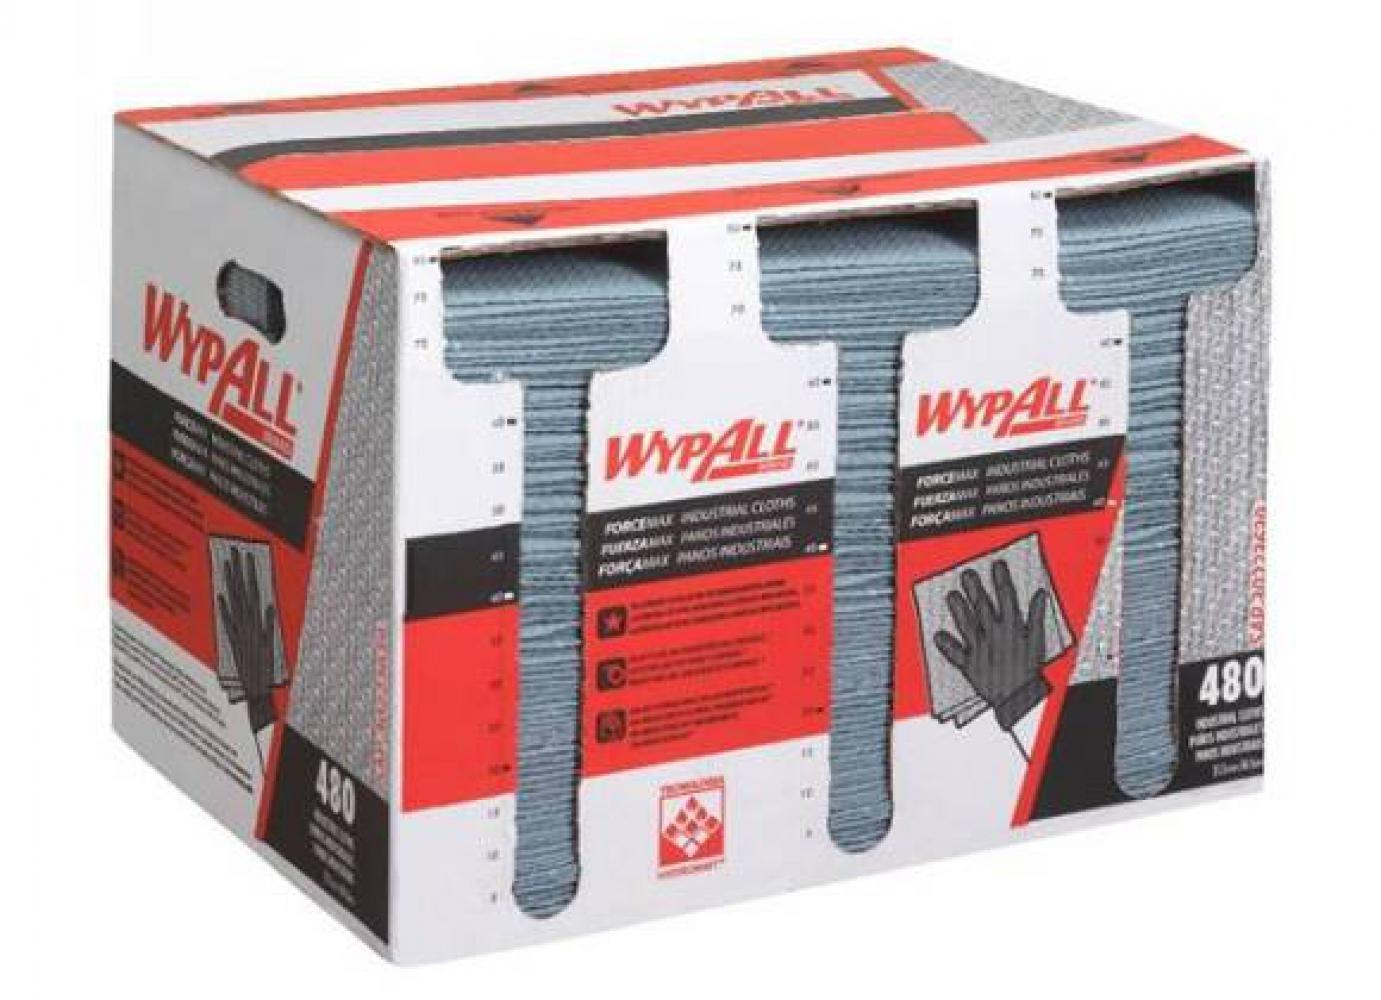 Acquista 480 Pezzi Wypall Forcemax Panno 17545665 | Glooke.com